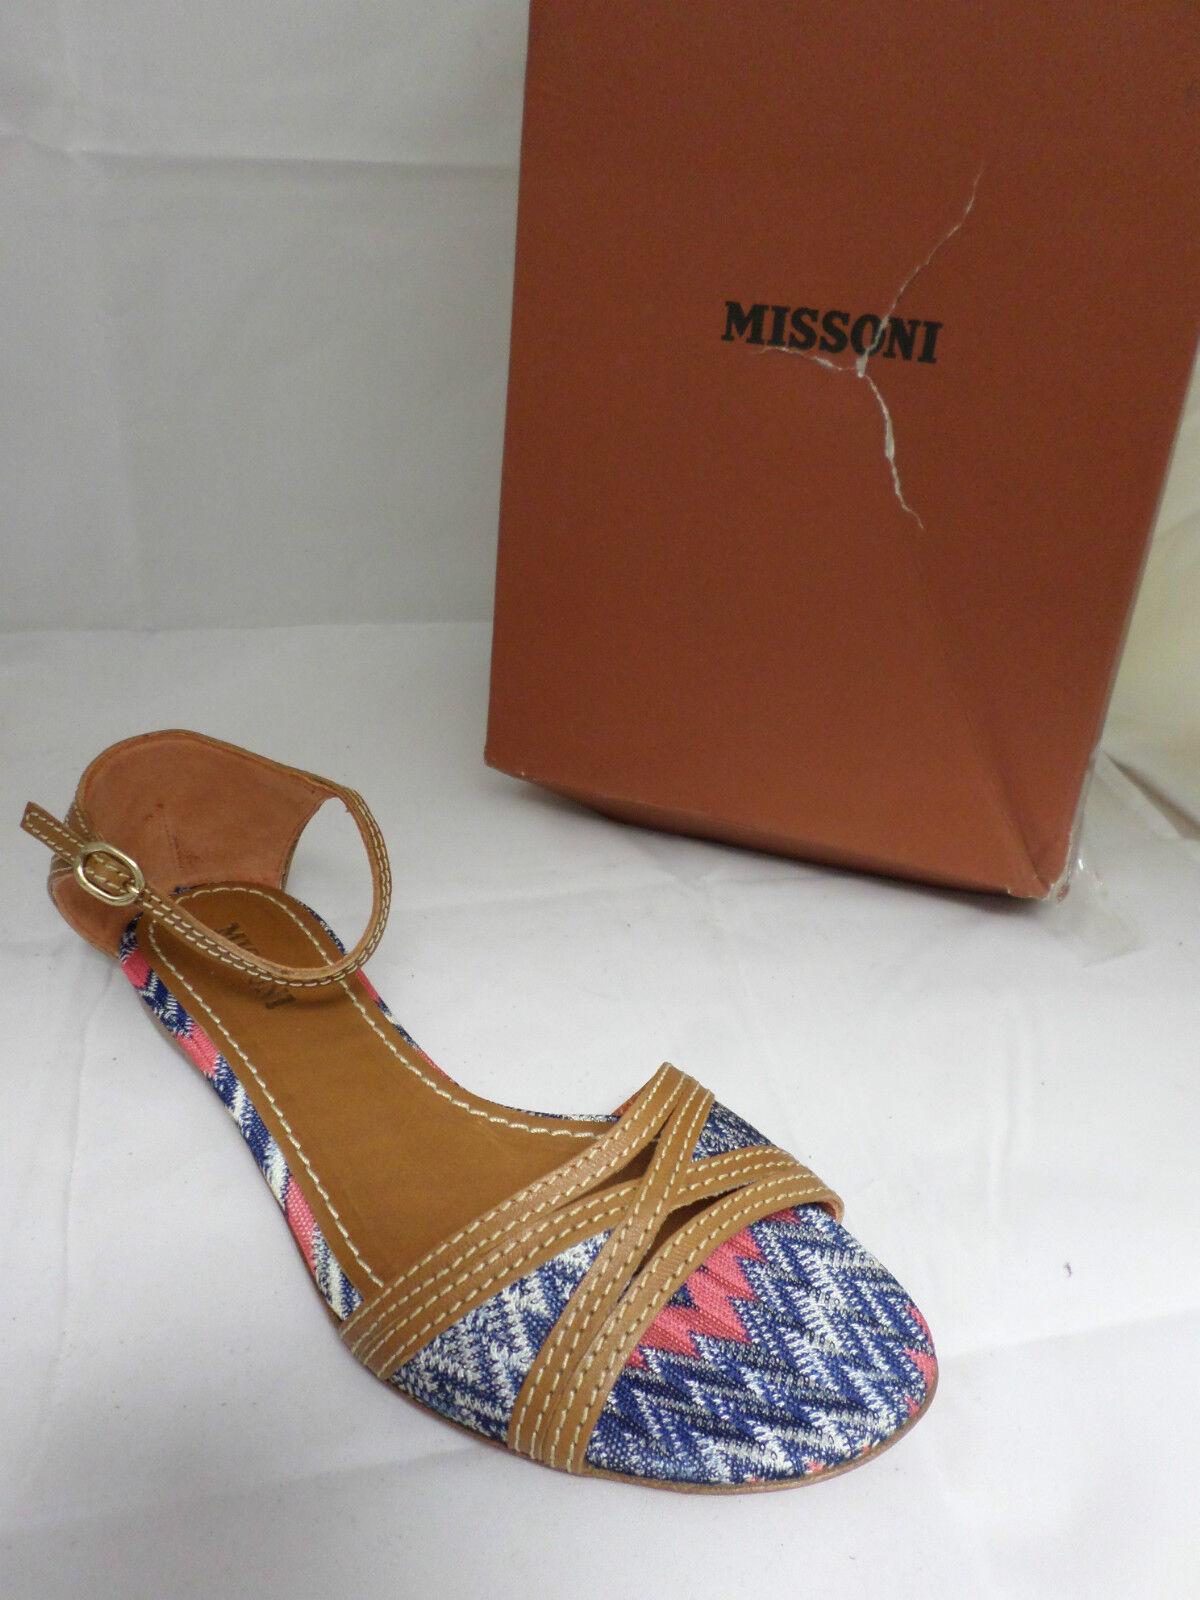 Missoni TM27 Textile Ankle Strap Sandals Blue Size 4 Uk 37 Eur EM 481